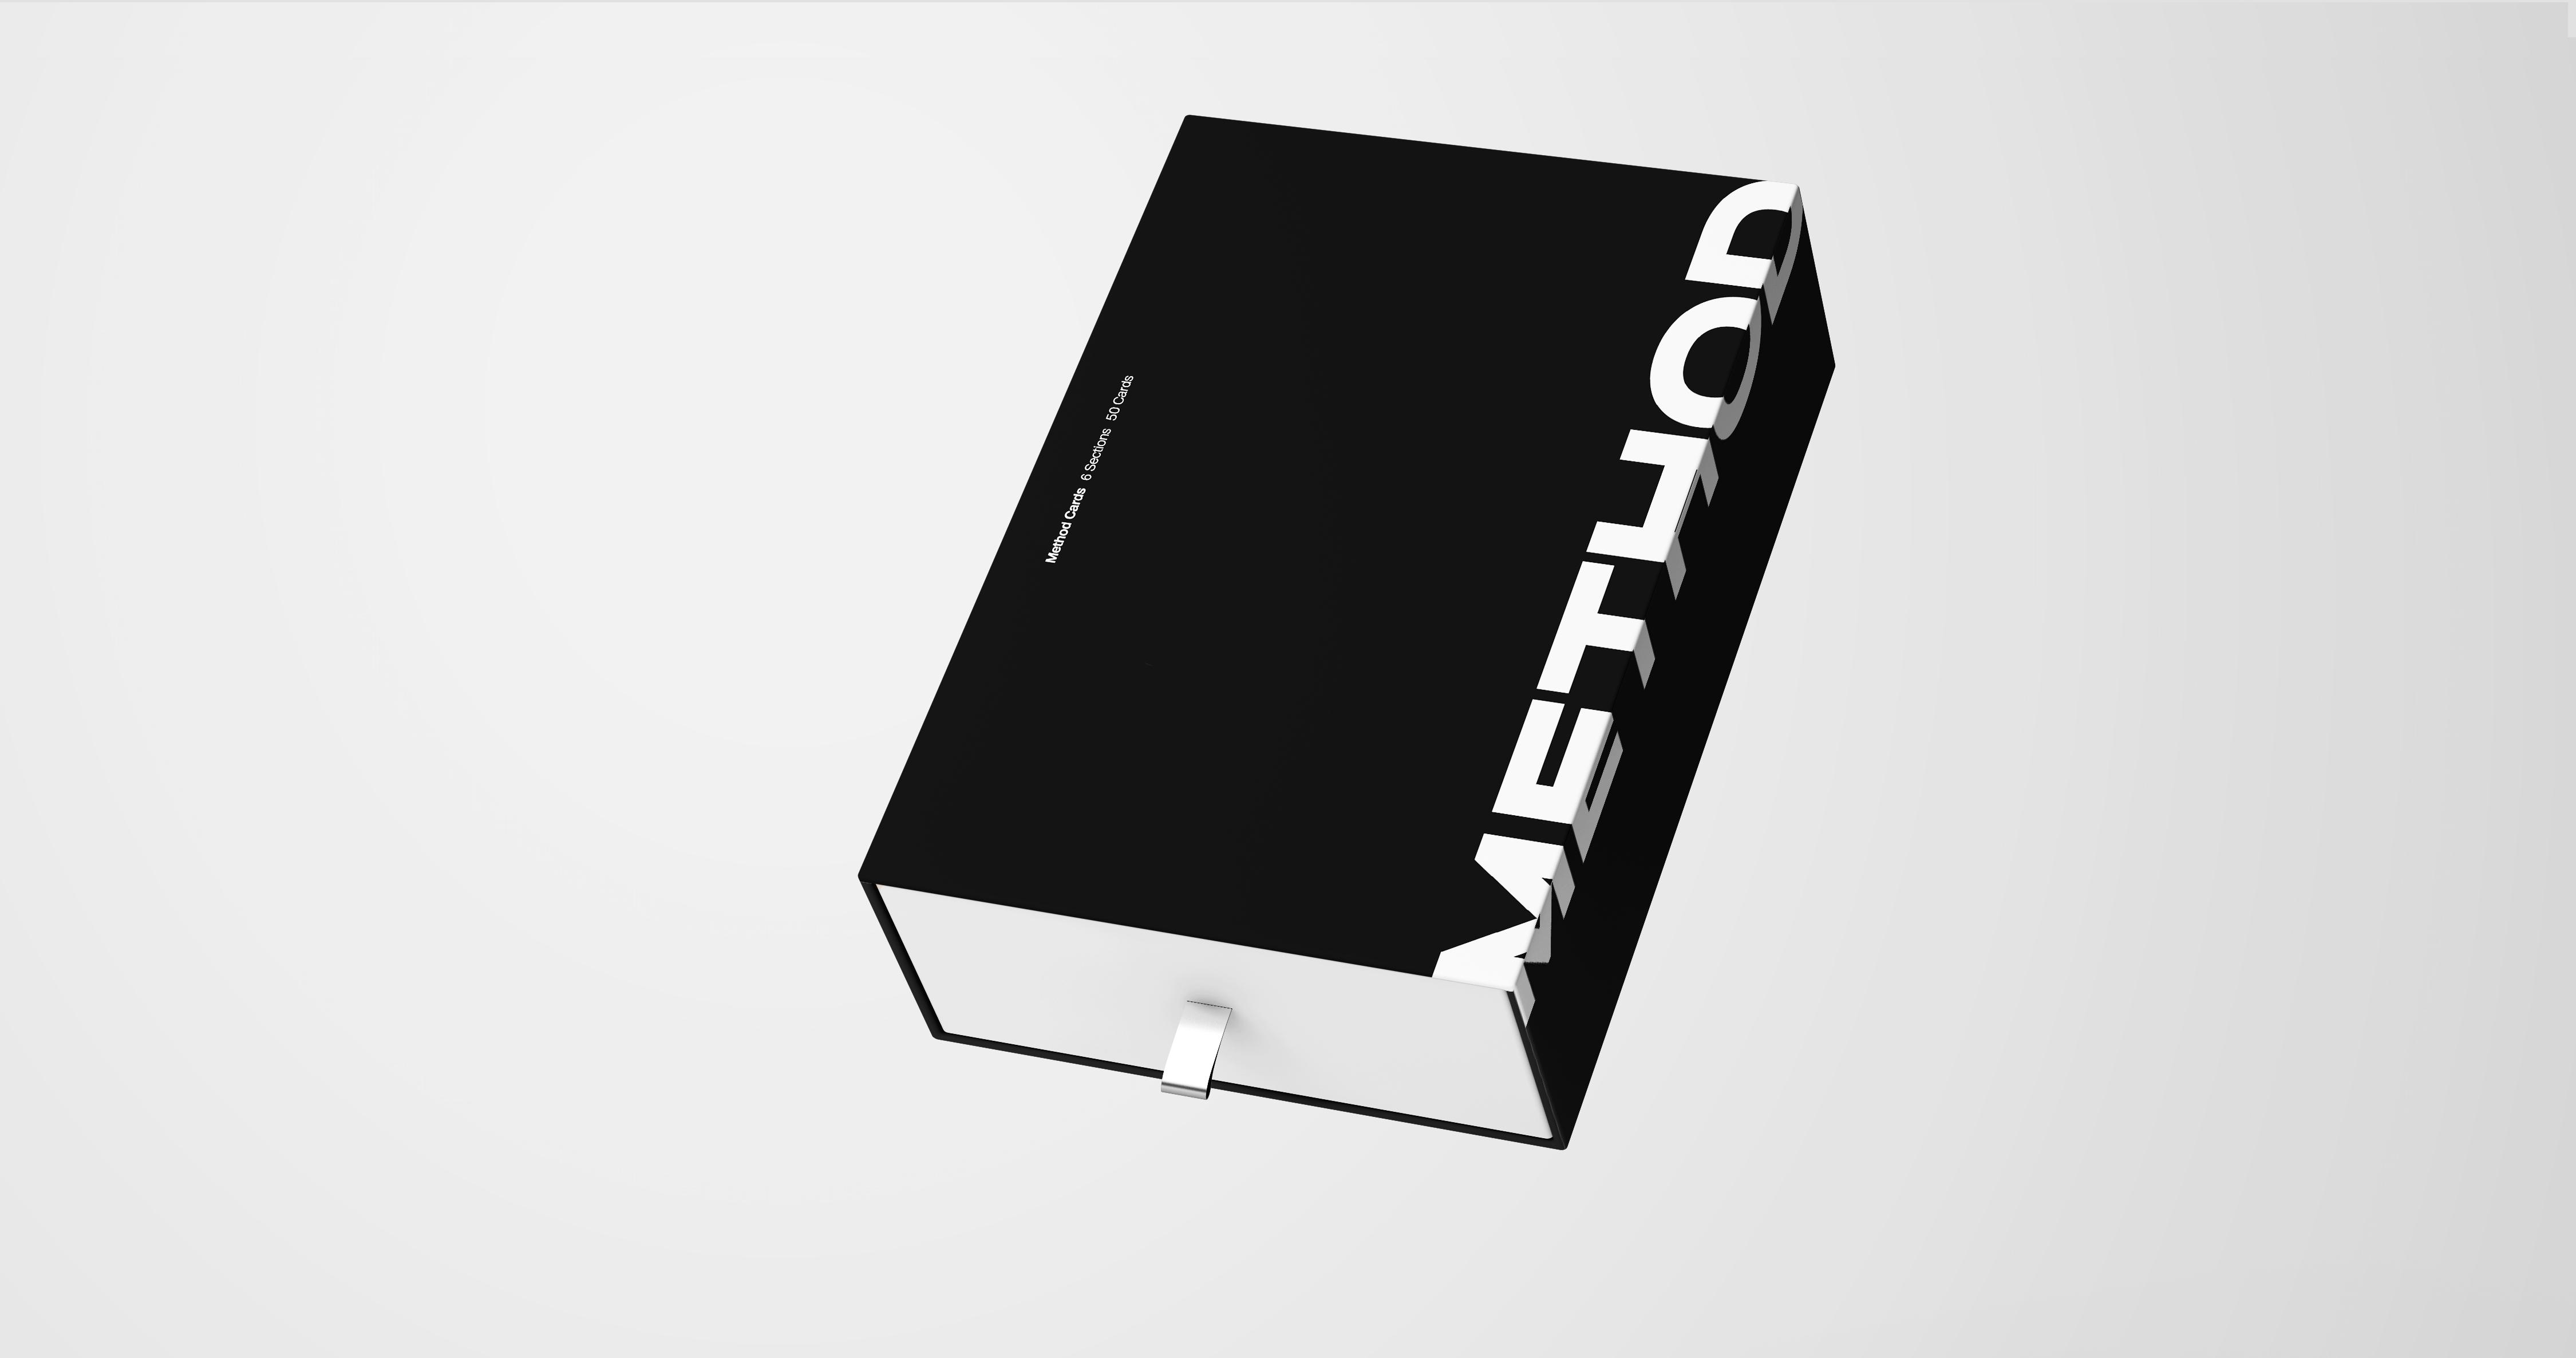 box_1 copy